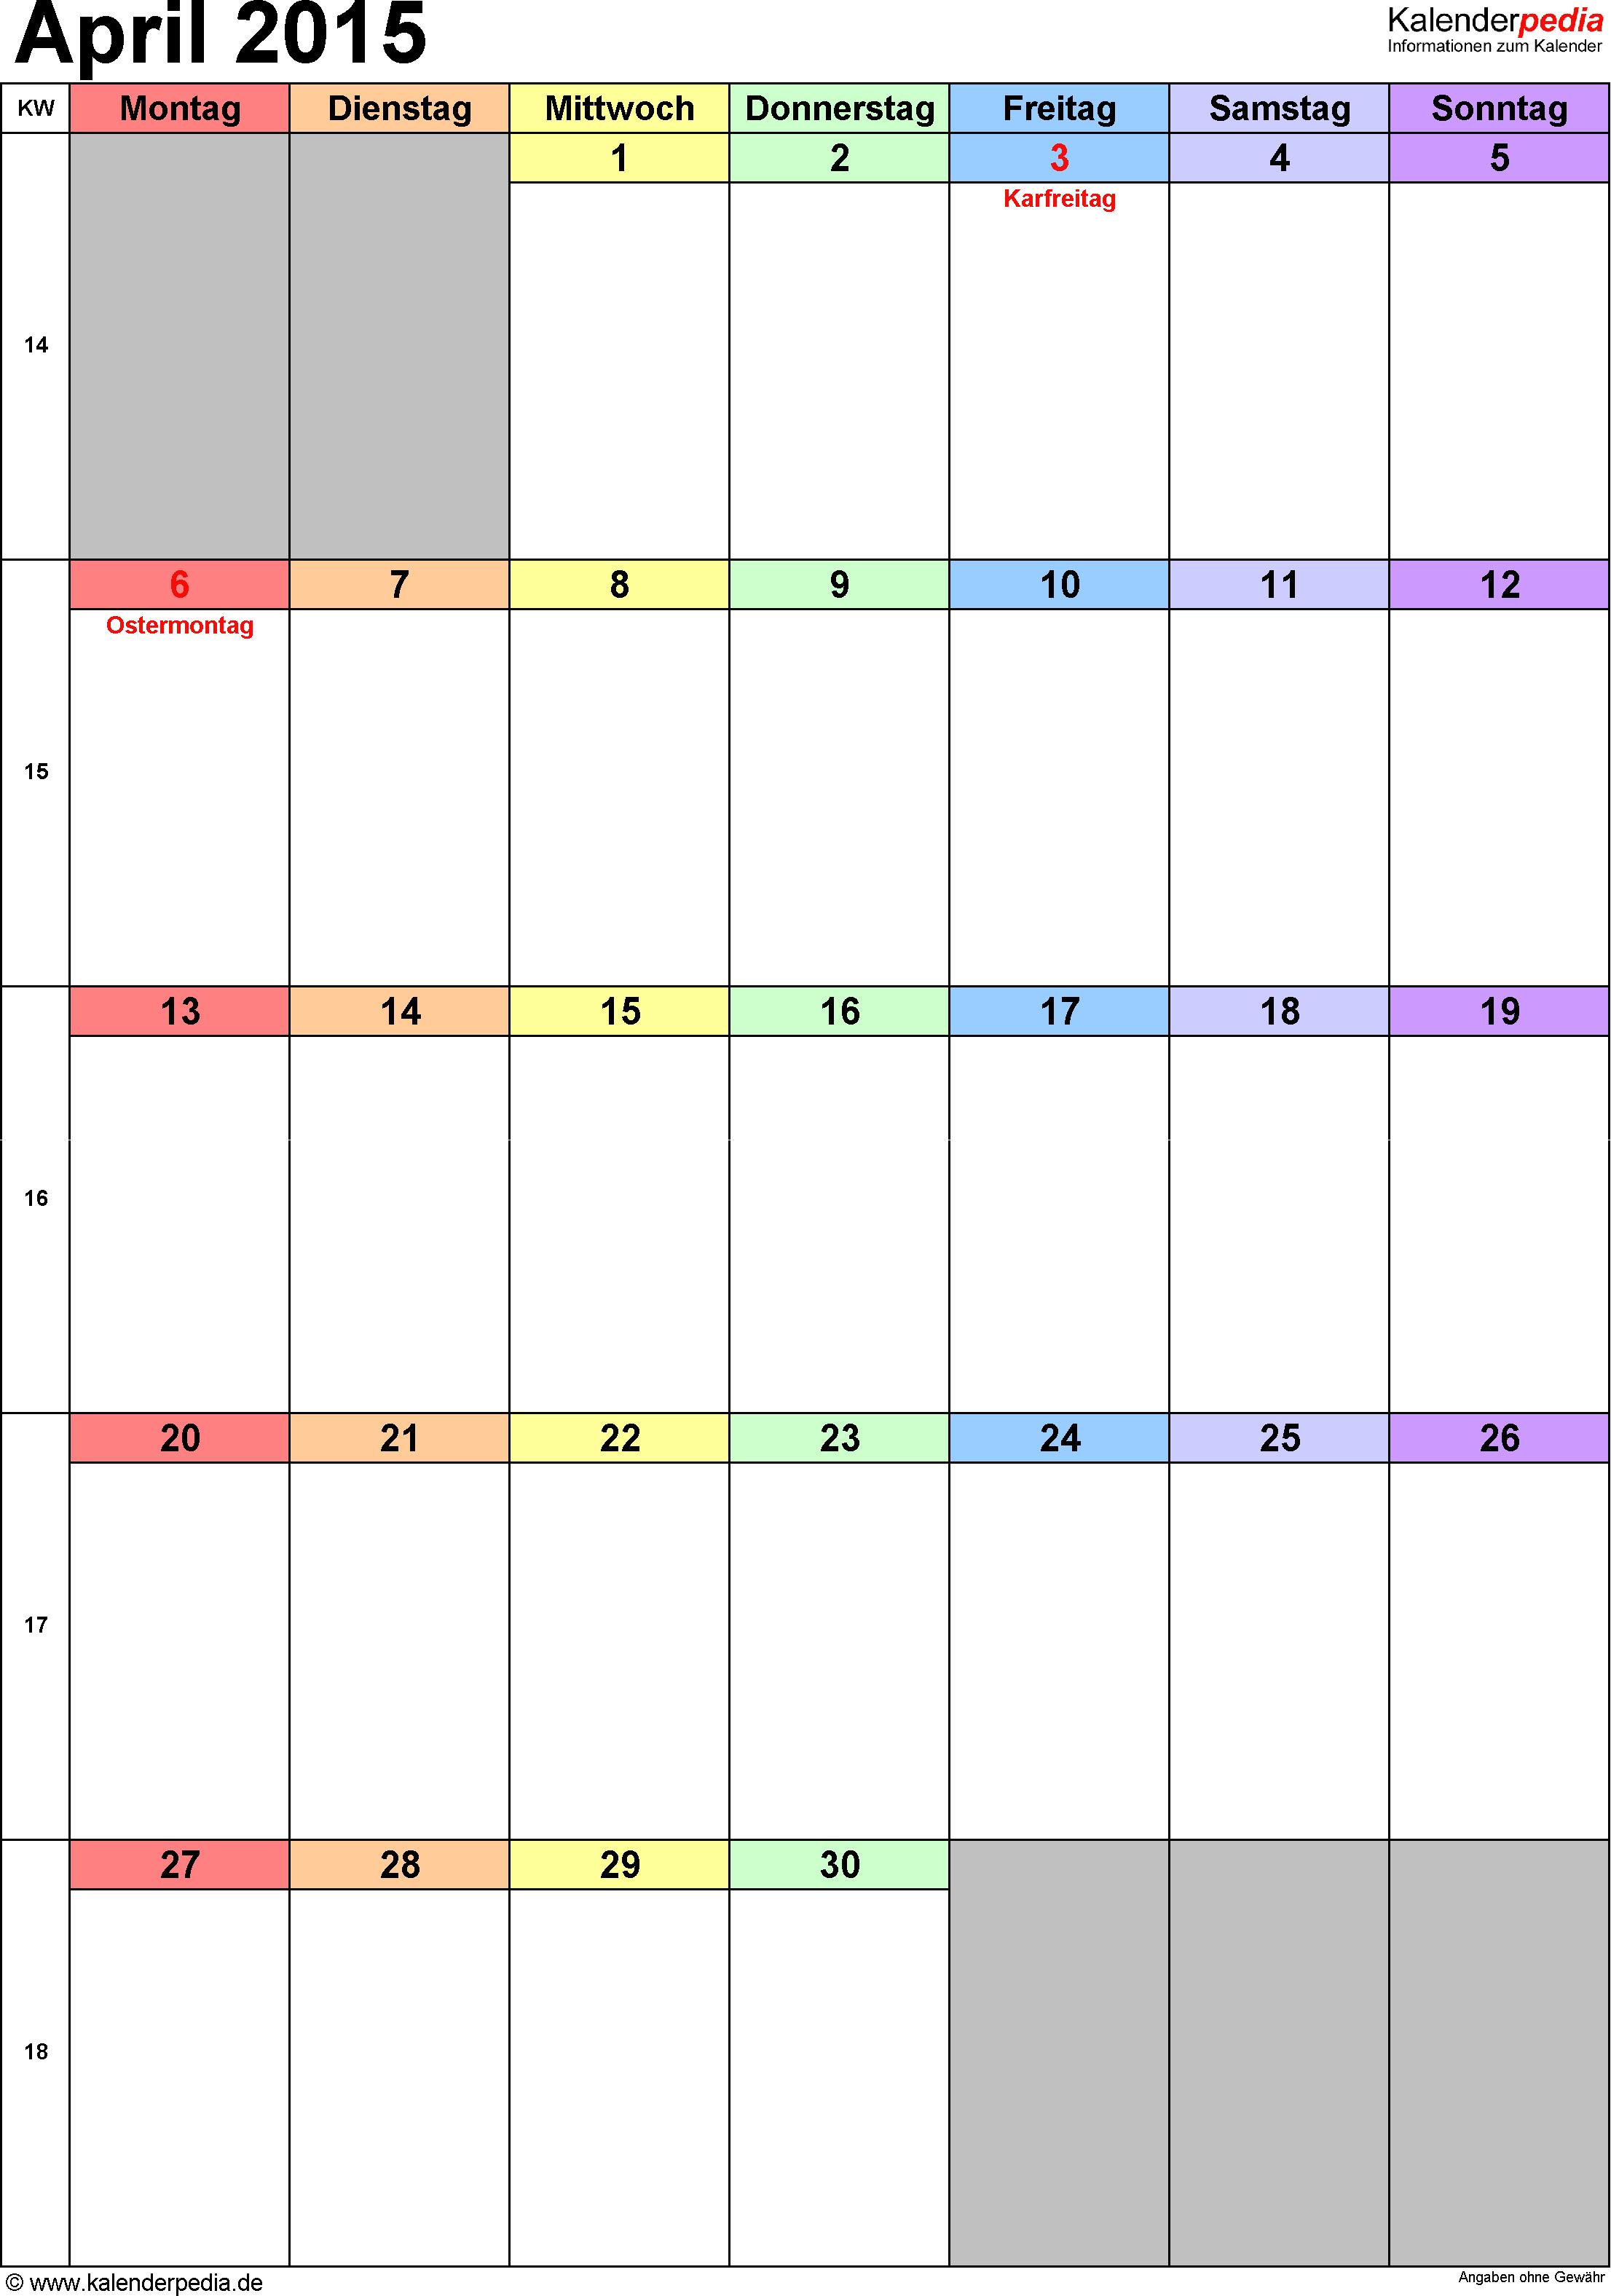 Kalender April 2015 (Hochformat) als PDF-Vorlage